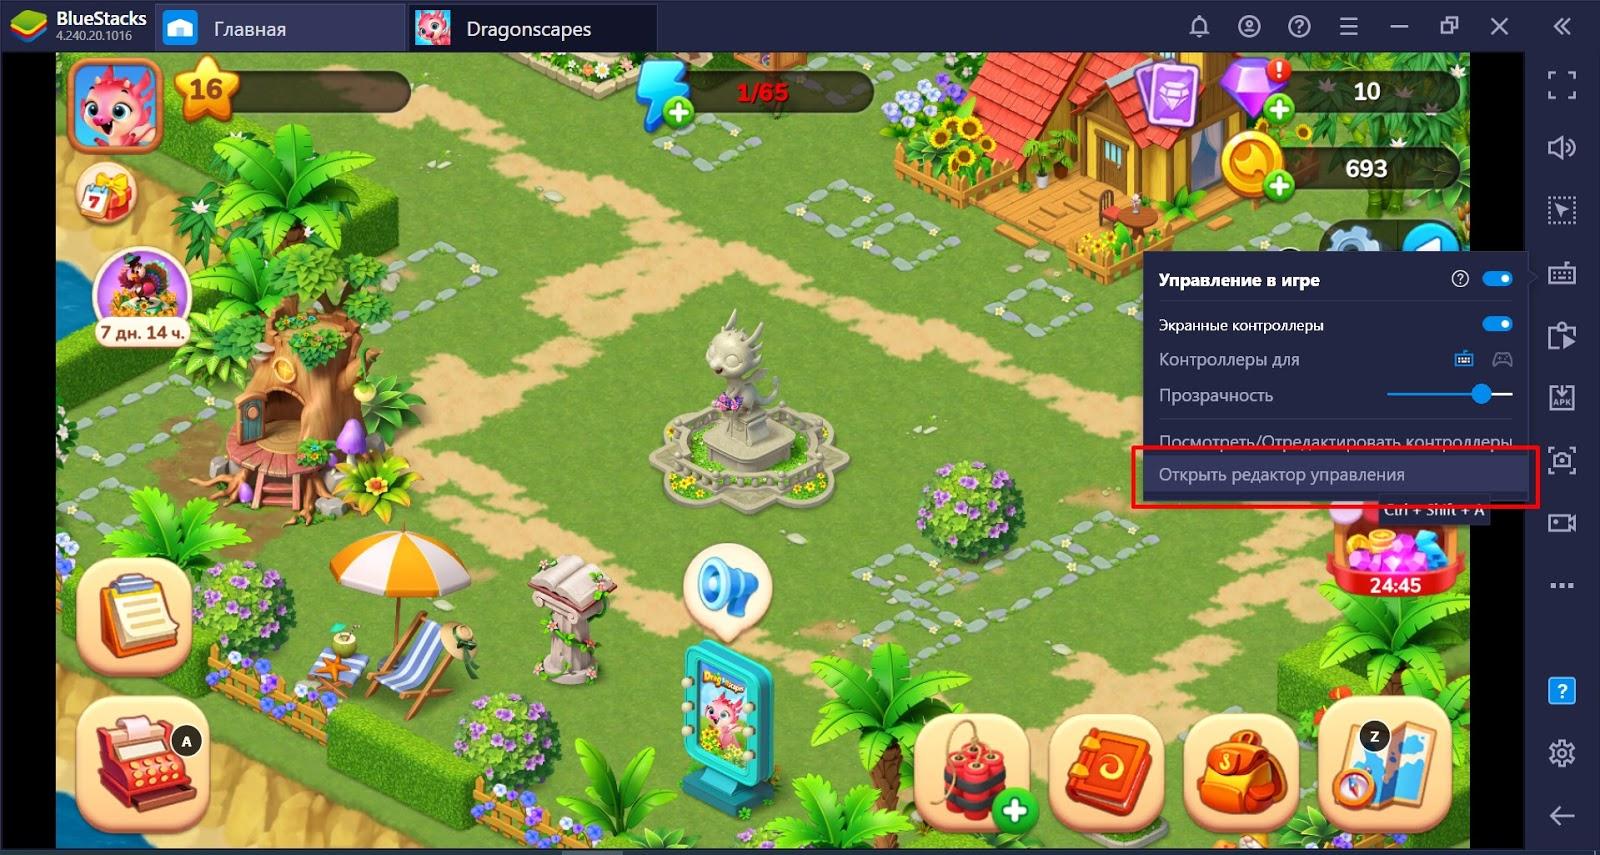 Руководство по настройке Dragonscapes Adventure: спасайте драконов и исследуйте острова с BlueStacks